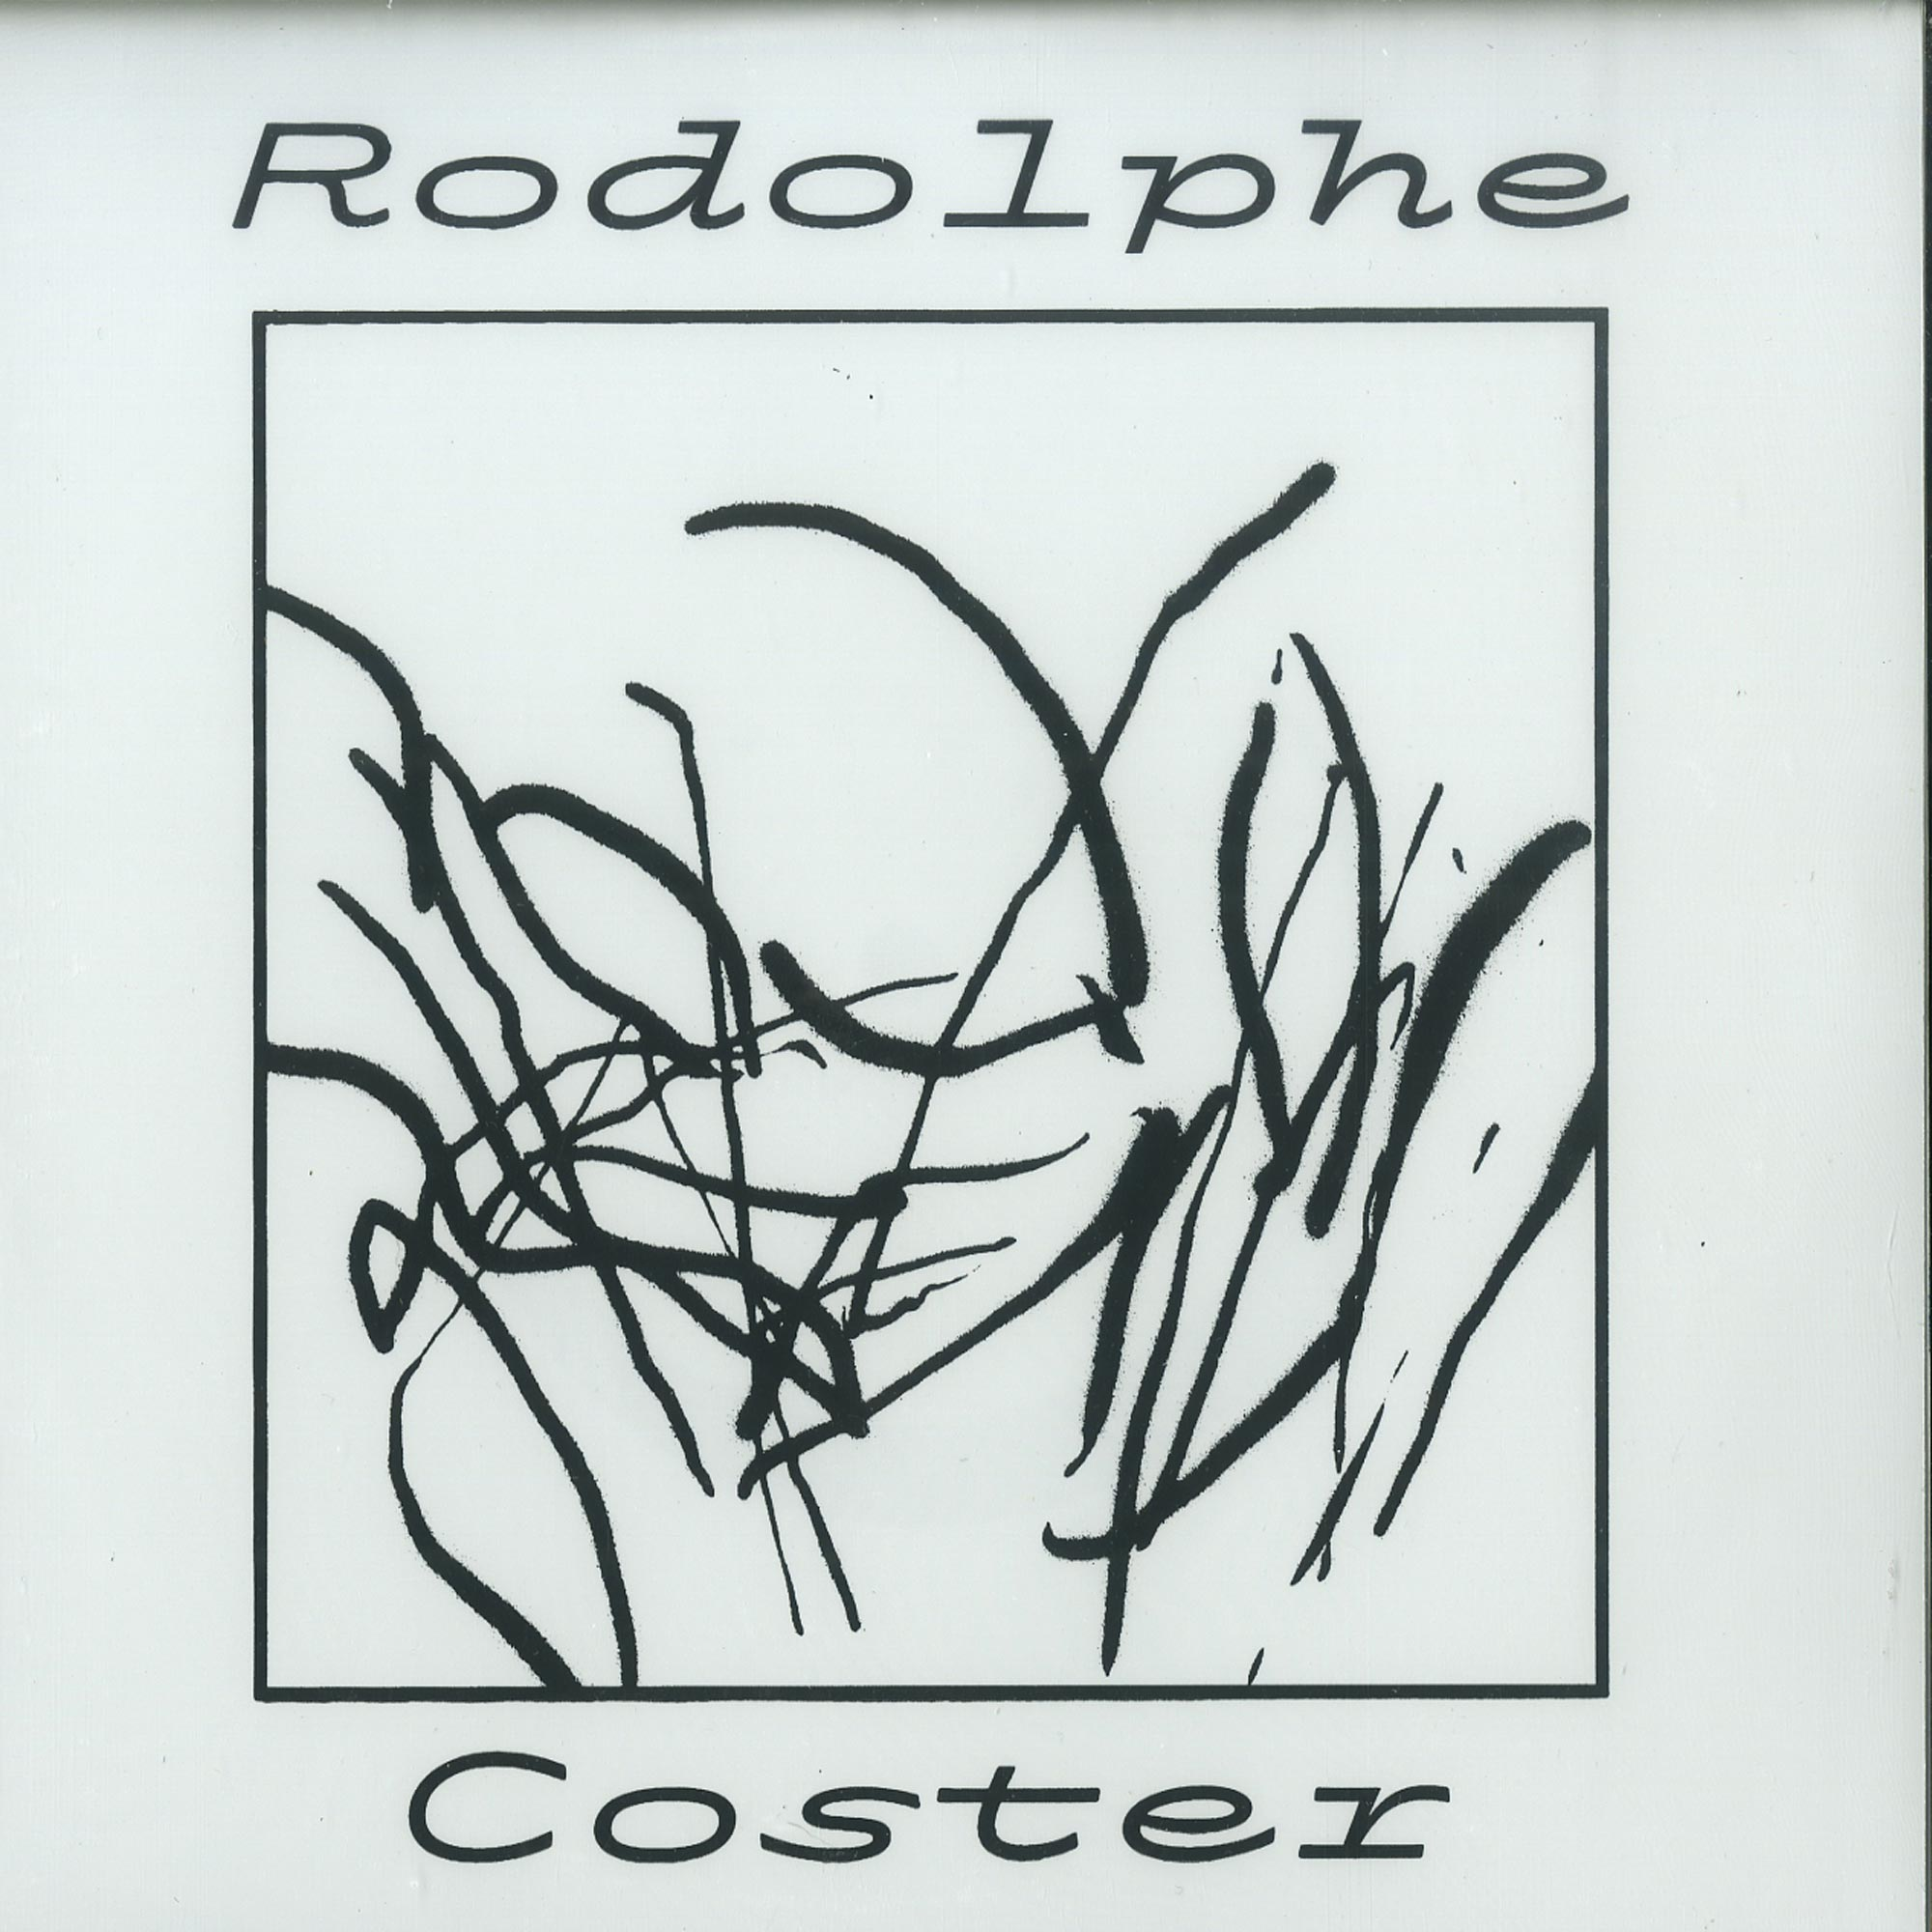 Rodolphe Coster - PLANTE